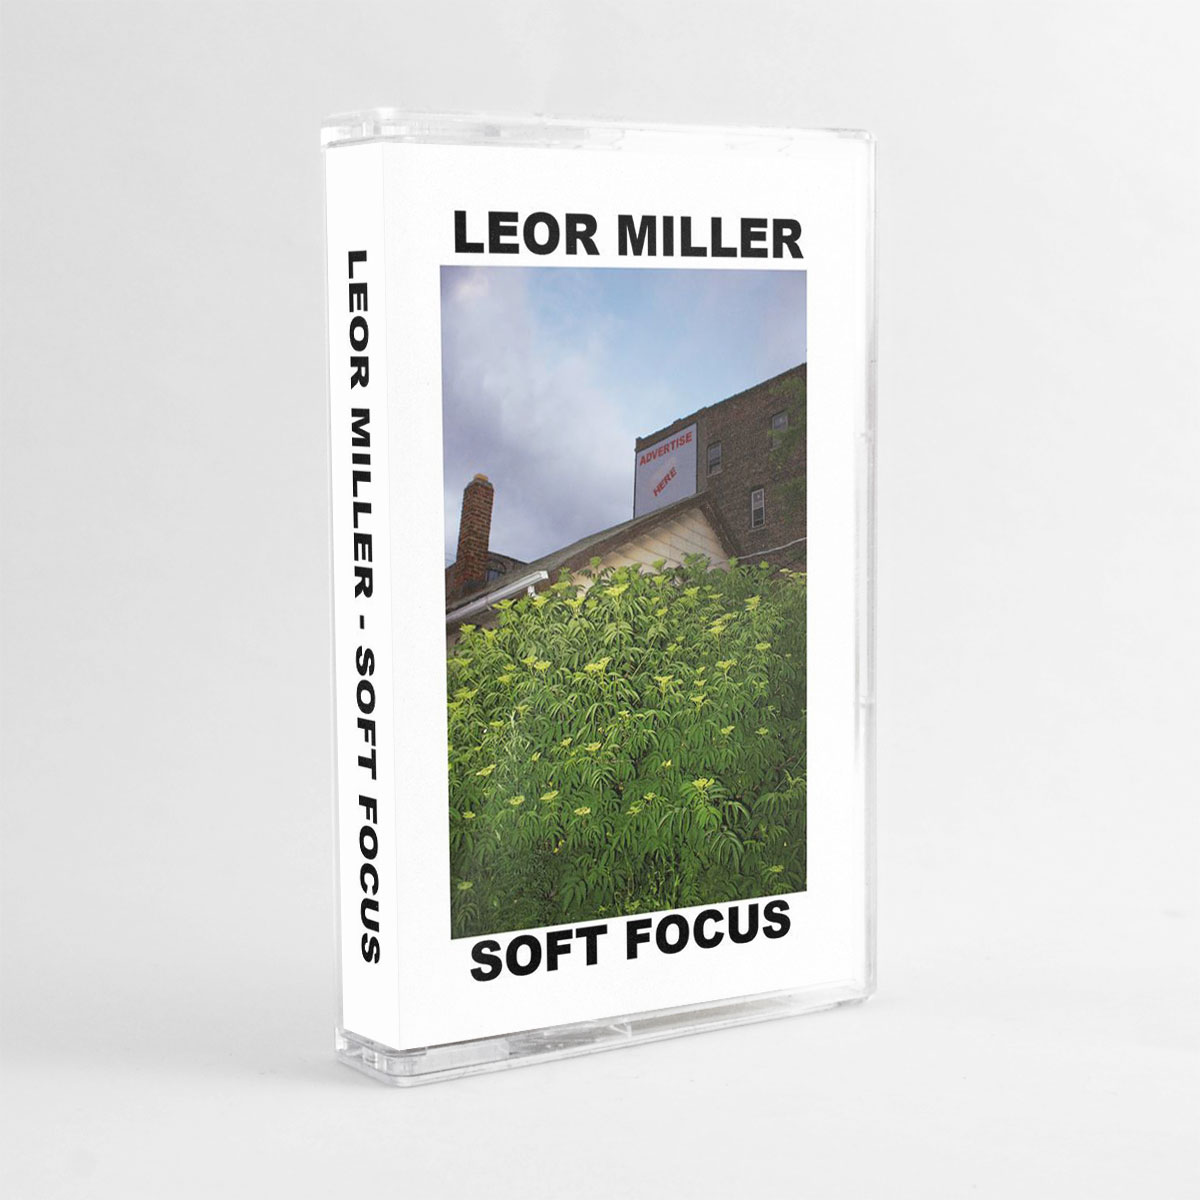 Leor Miller - Soft Focus [CS]